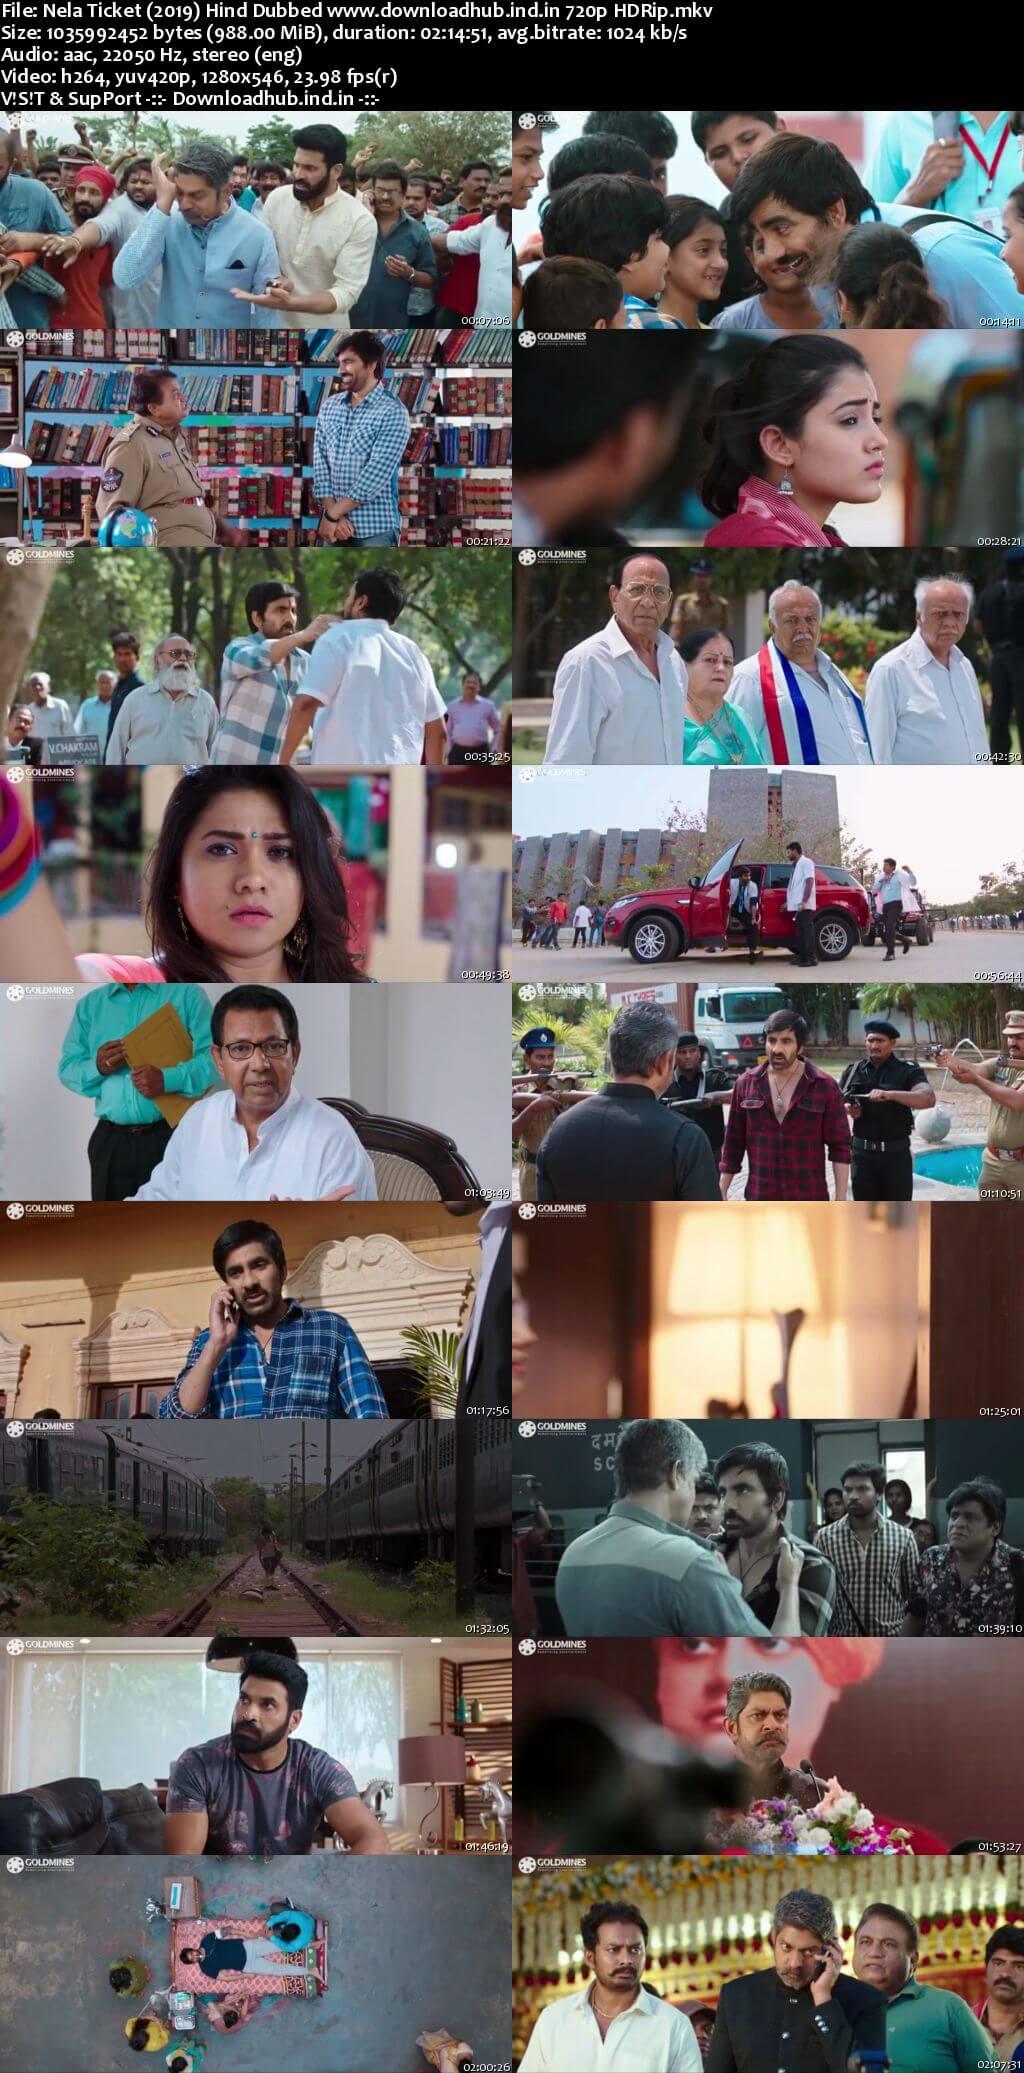 Nela Ticket 2019 Hindi Dubbed 720p HDRip x264